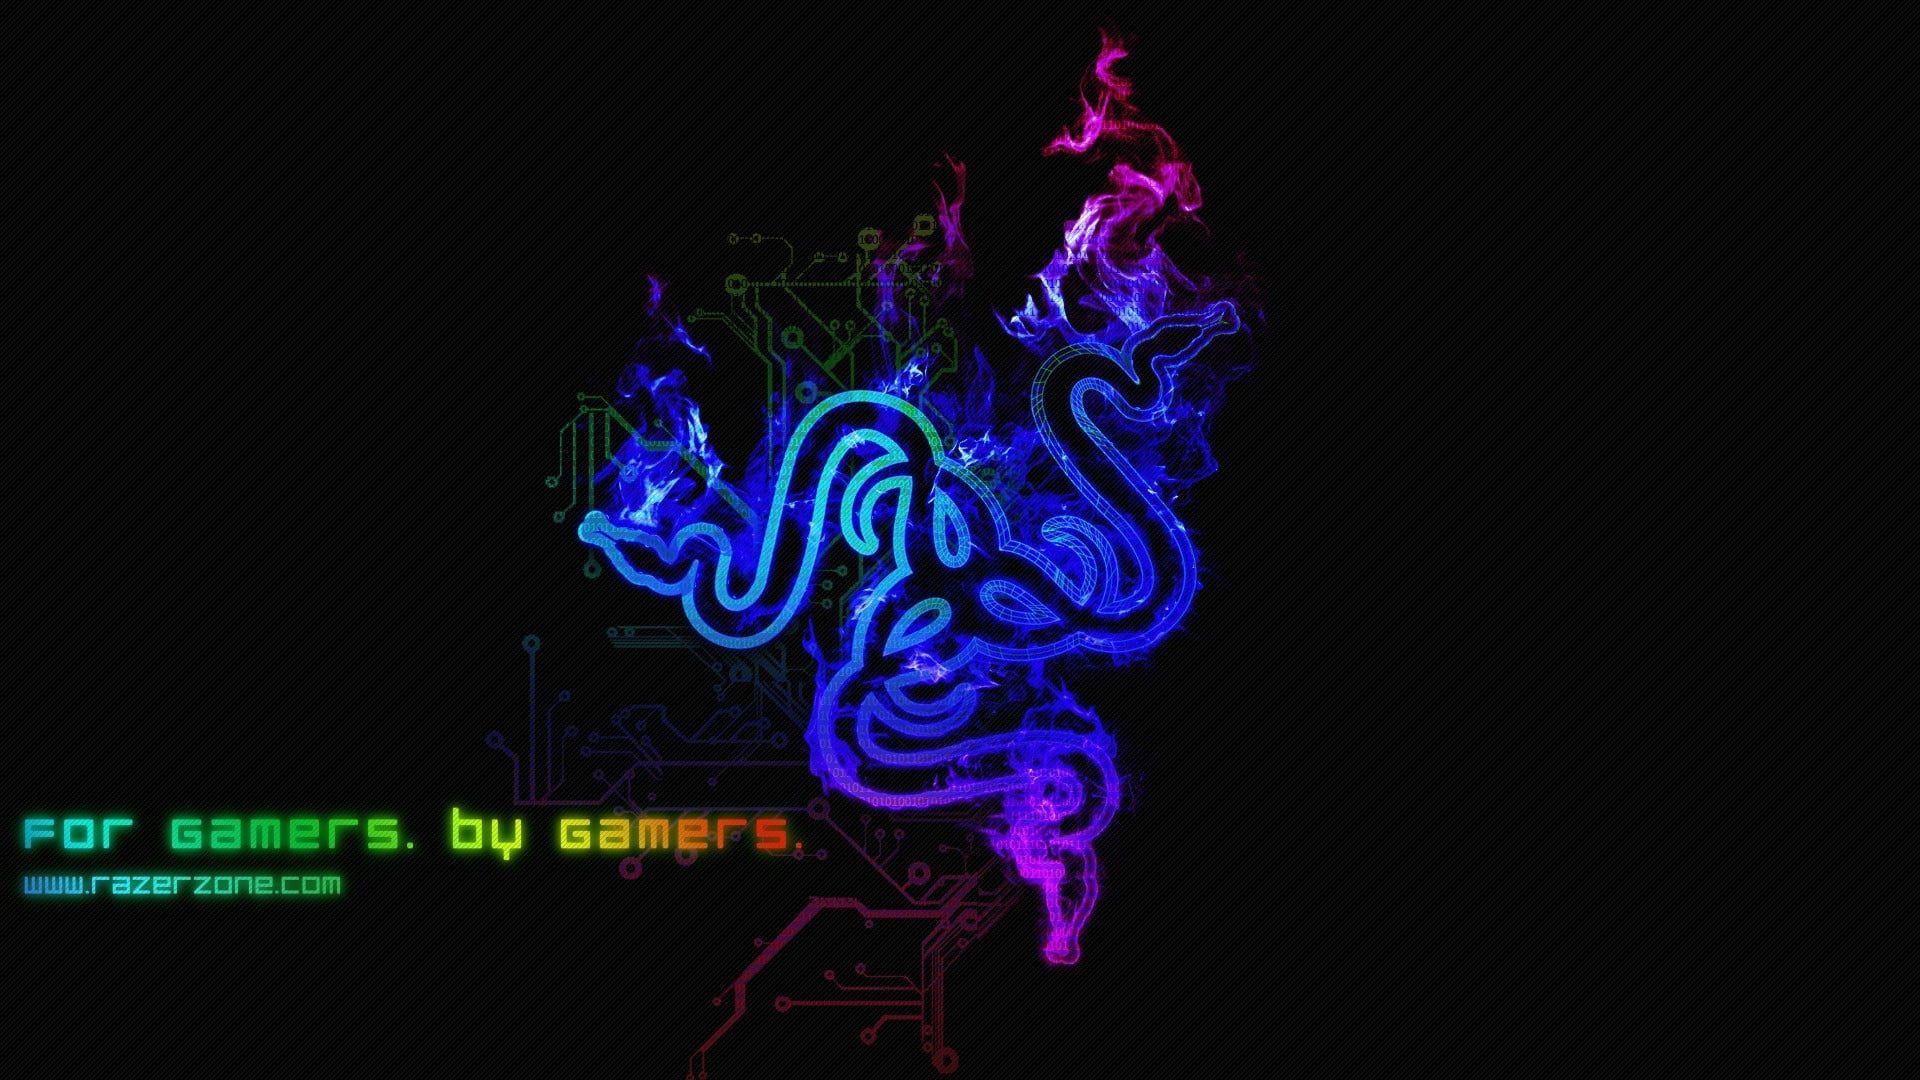 Razer Logo Razer Video Games Pc Gaming Simple Background Simple Colorful 1080p Wallpaper Hdw Simple Backgrounds Simple Background Hd Gaming Wallpapers Hd